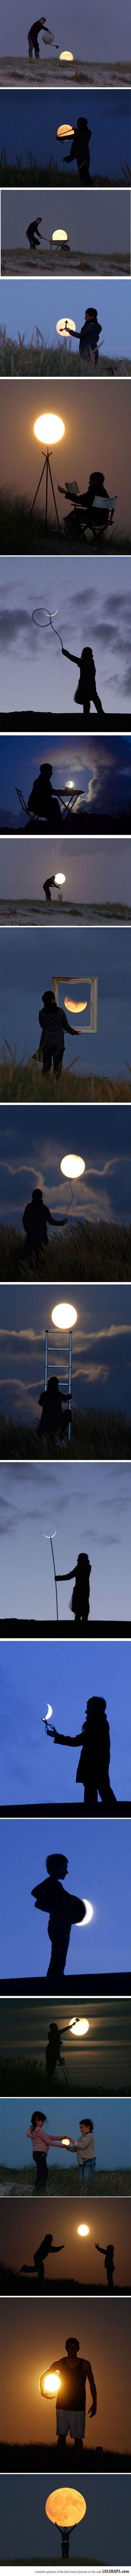 Having Fun With The Moon